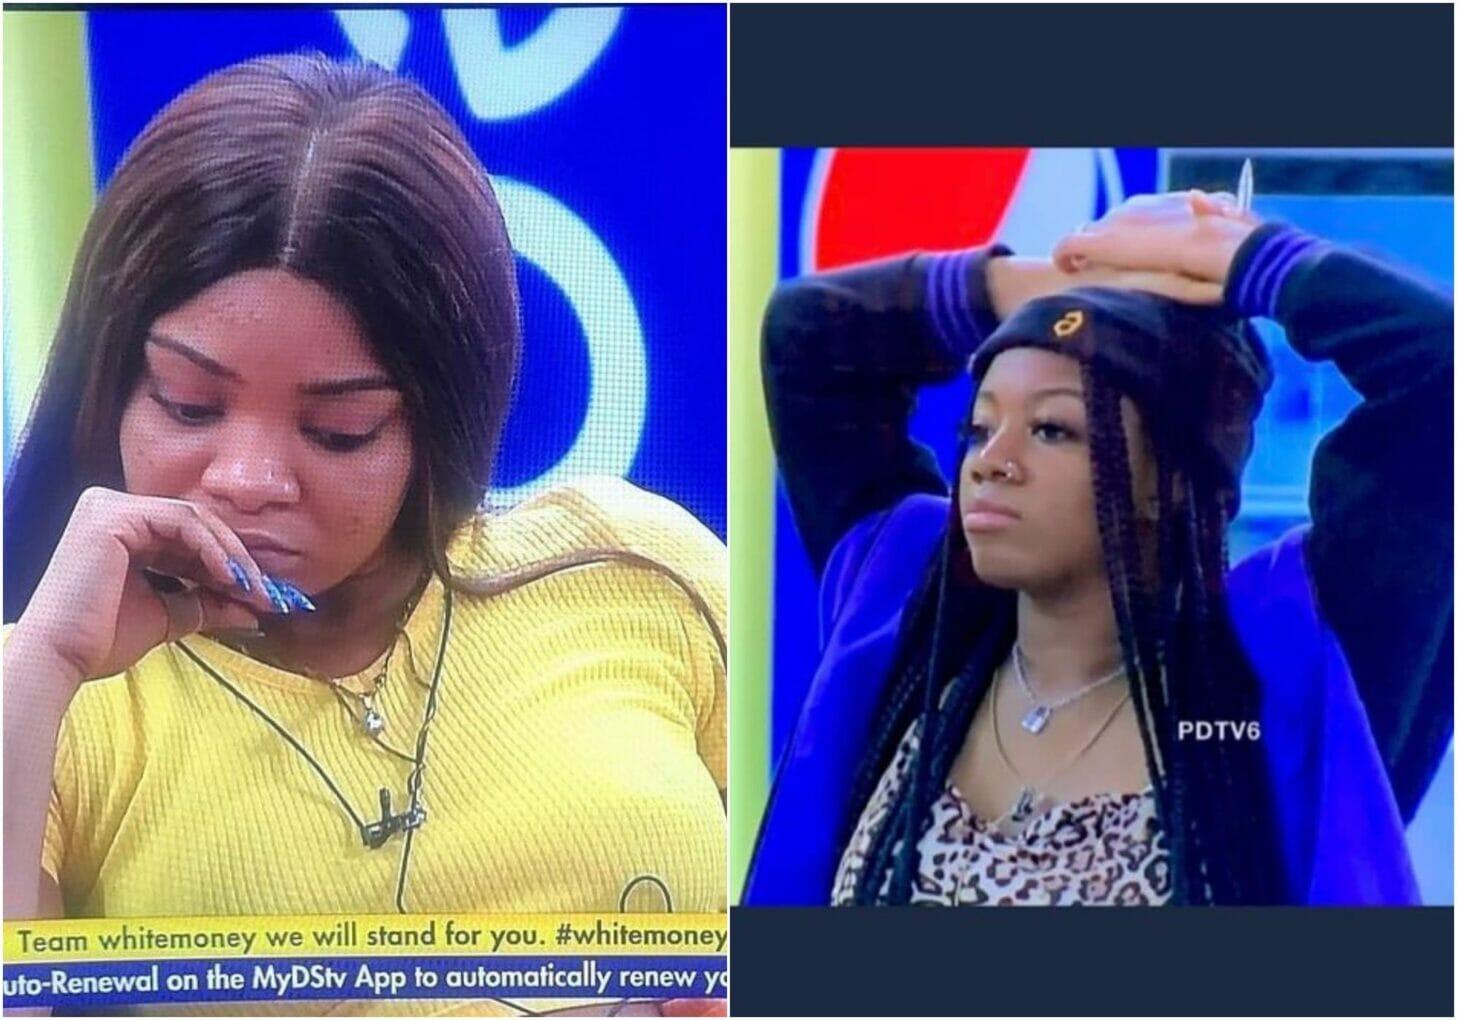 pite a sluggish start, the Big Brother Naija, Shine Ya Eye, is getting spiced up with dramas among the housemates.